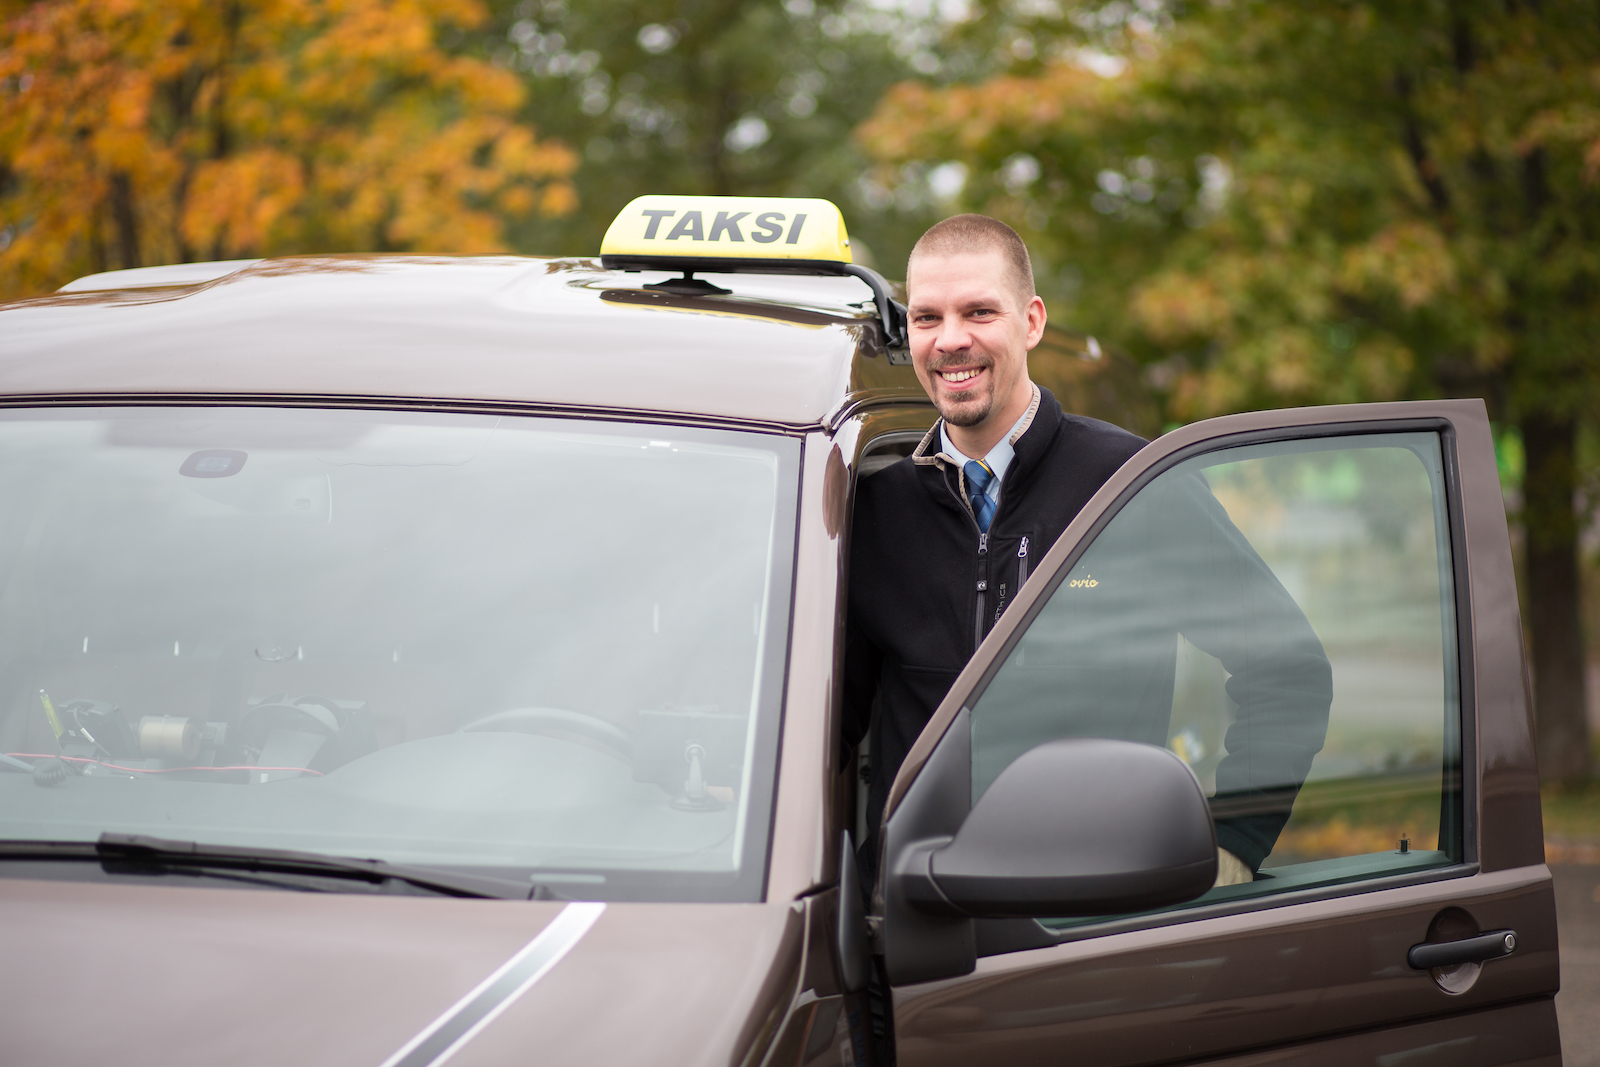 Taksinkuljettajan Ajolupa Hinta